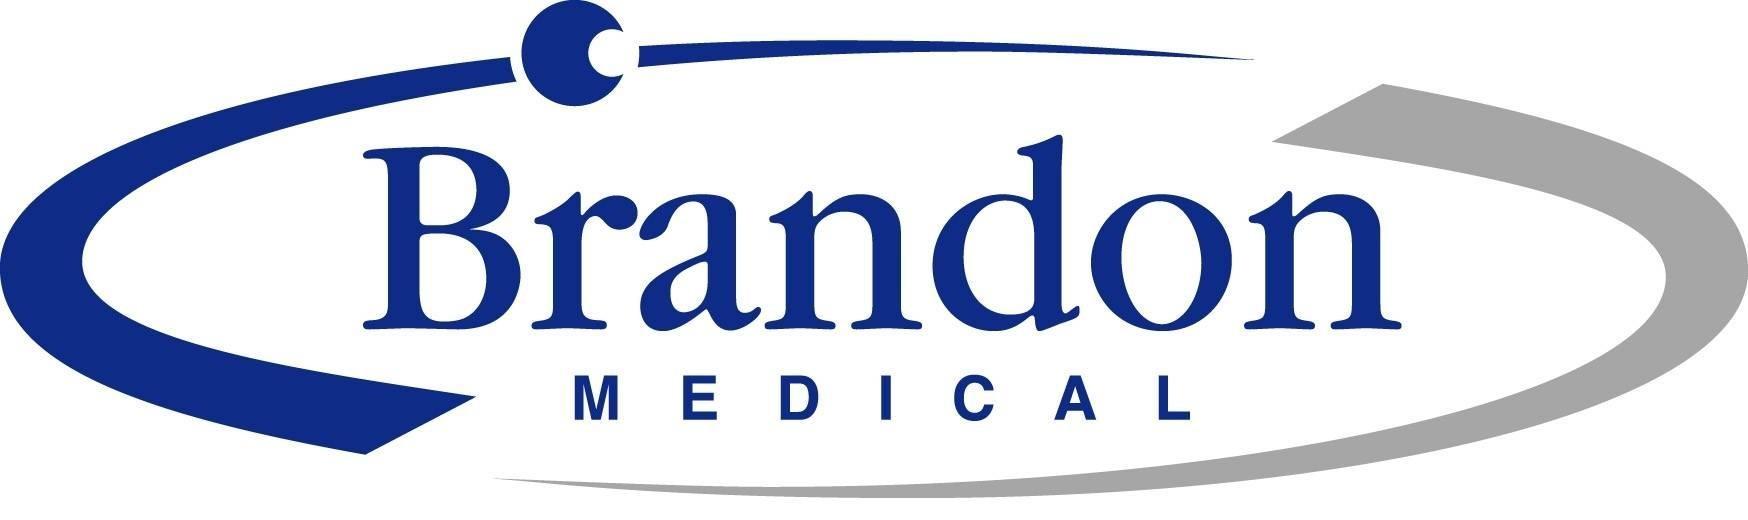 Brandon Medical Co. Ltd.